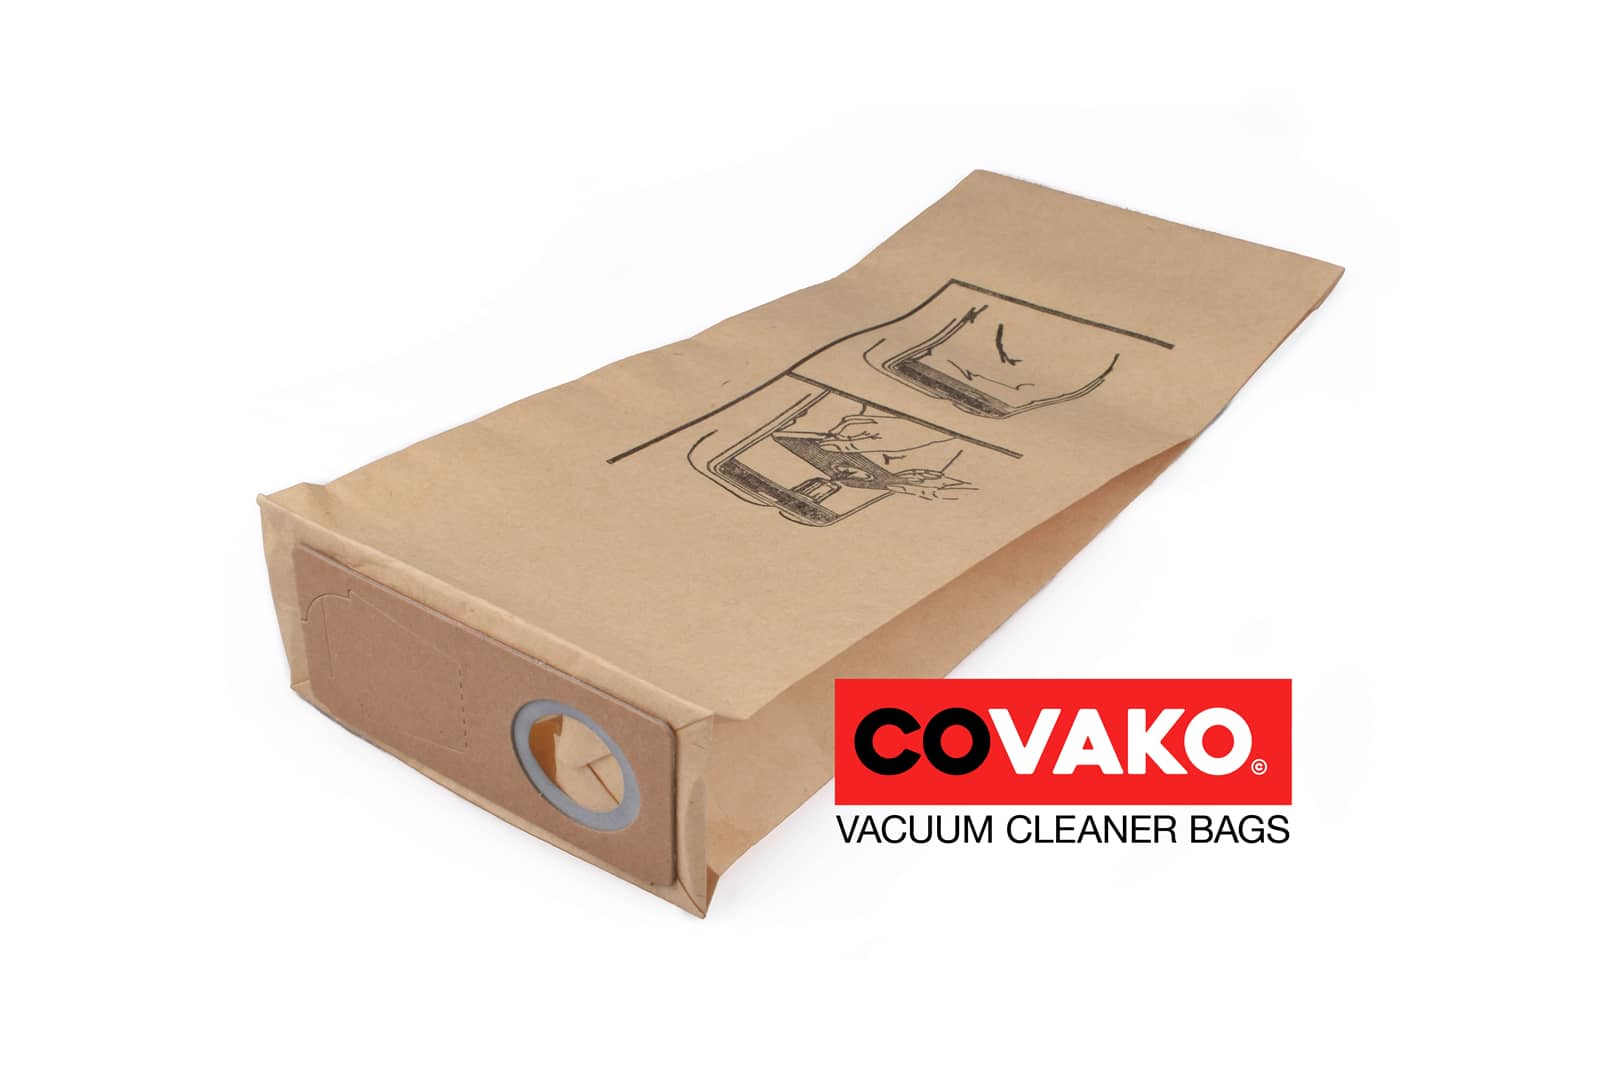 Alto GU 350 A / Papier - Alto sacs d'aspirateur